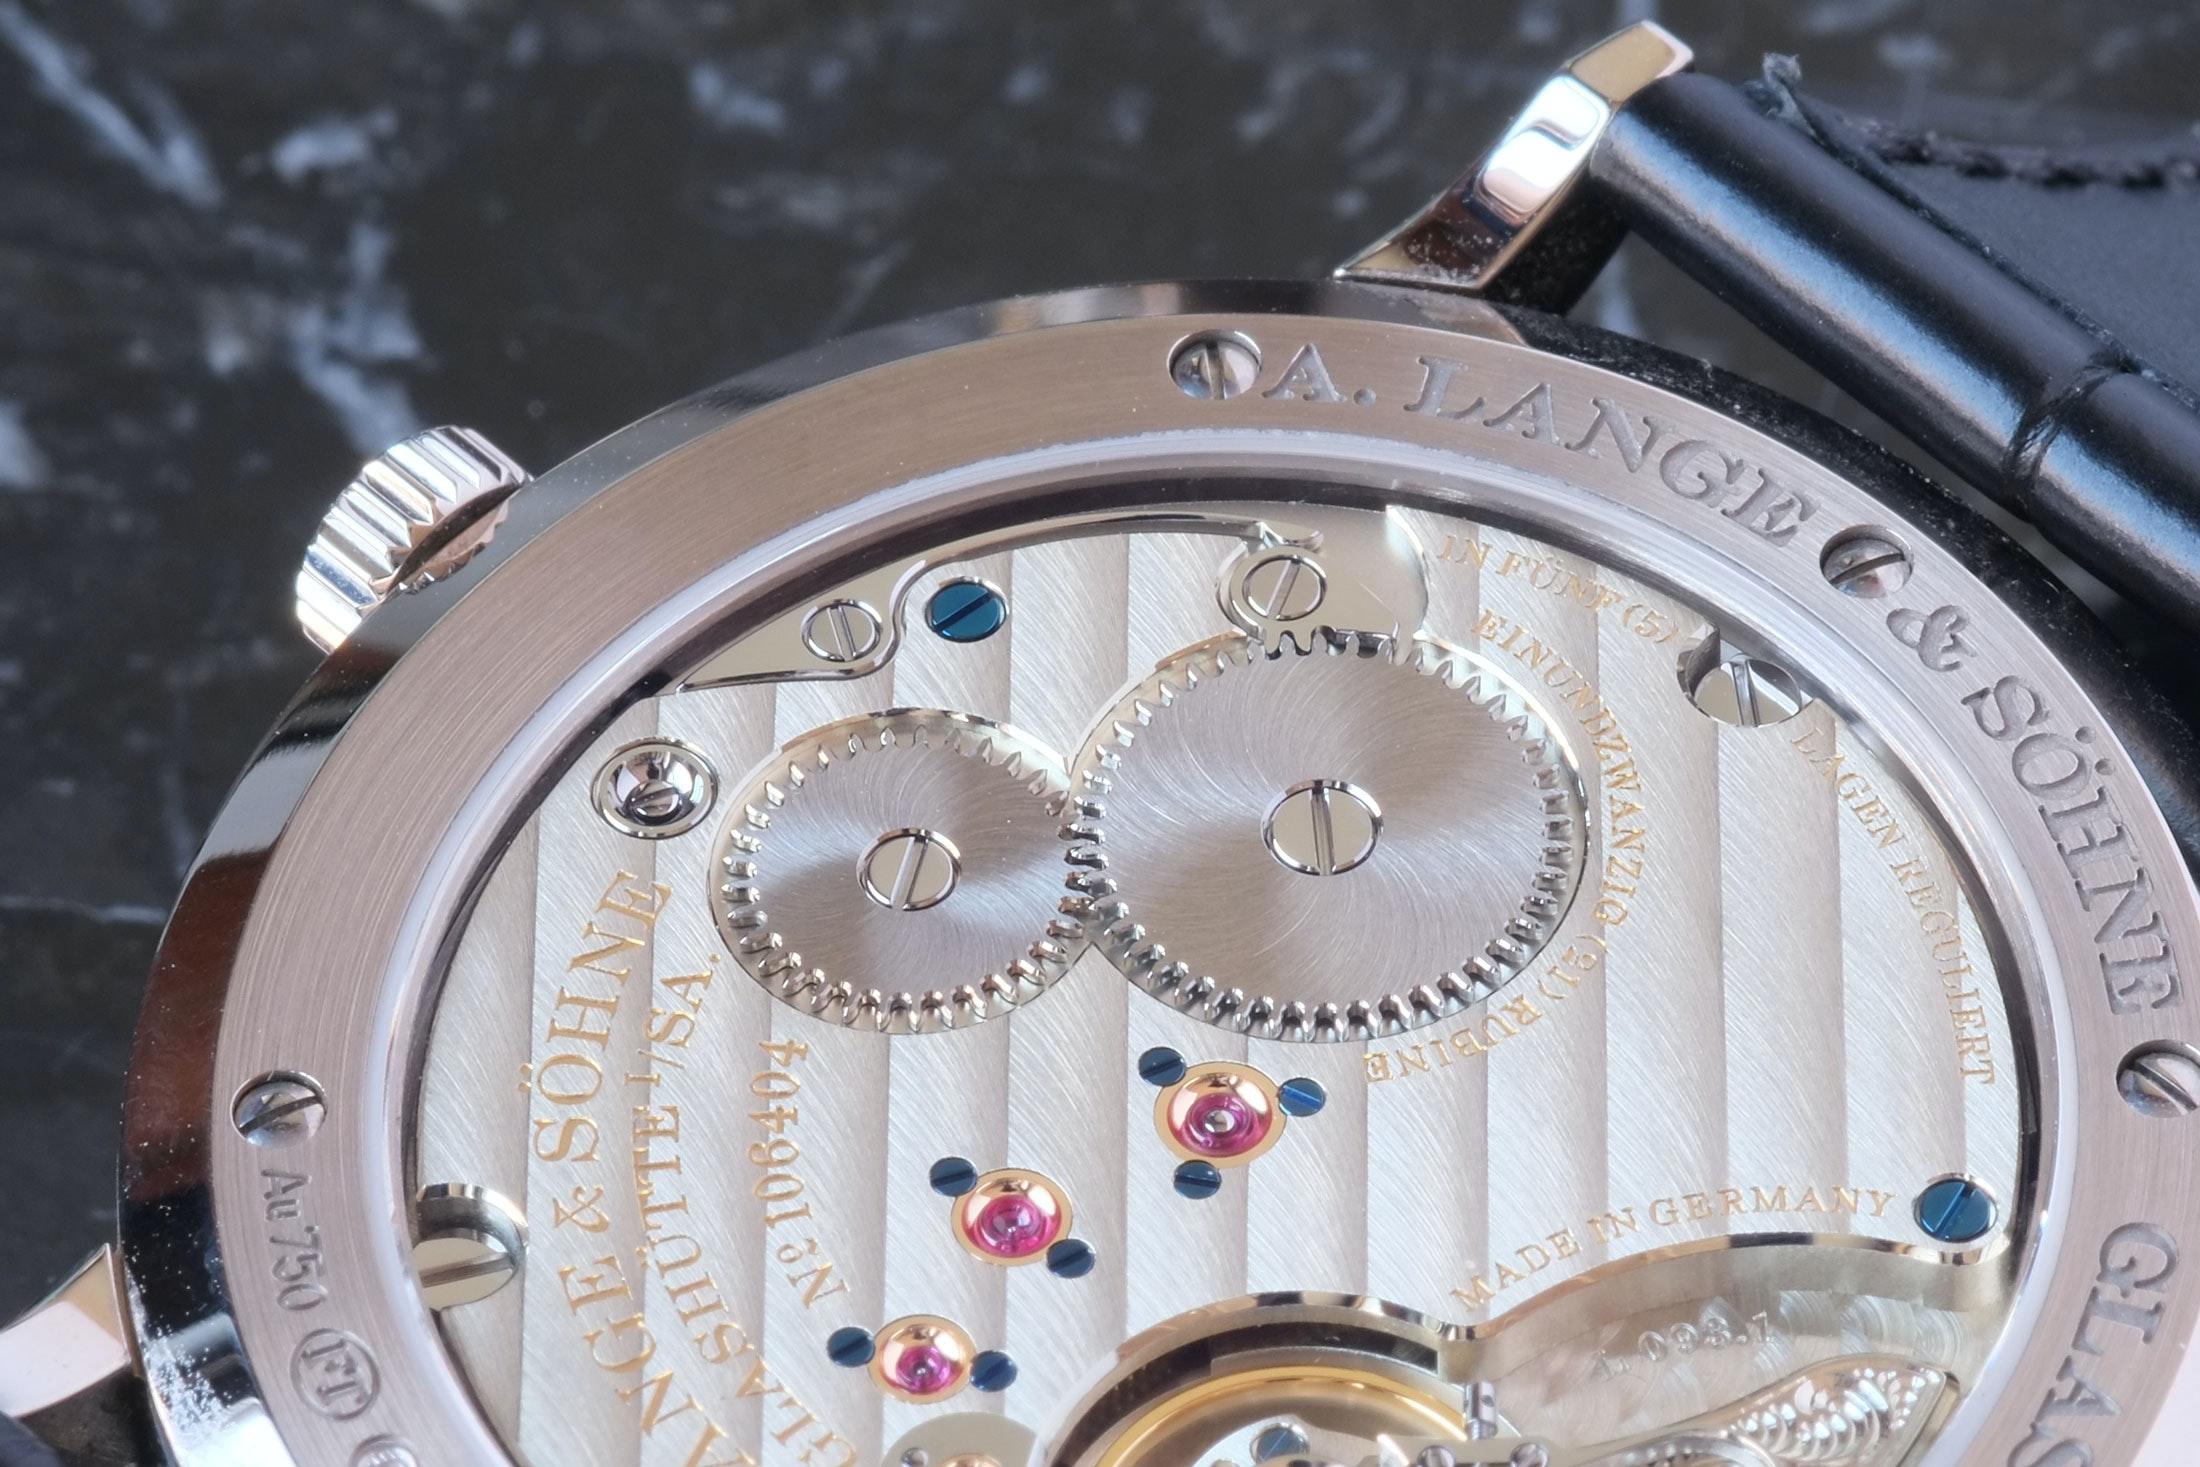 lange sohne movement saxonia thin finishing A Week On The Wrist: The A. Lange & Söhne Saxonia Thin 37mm A Week On The Wrist: The A. Lange & Söhne Saxonia Thin 37mm lange saxonia 13